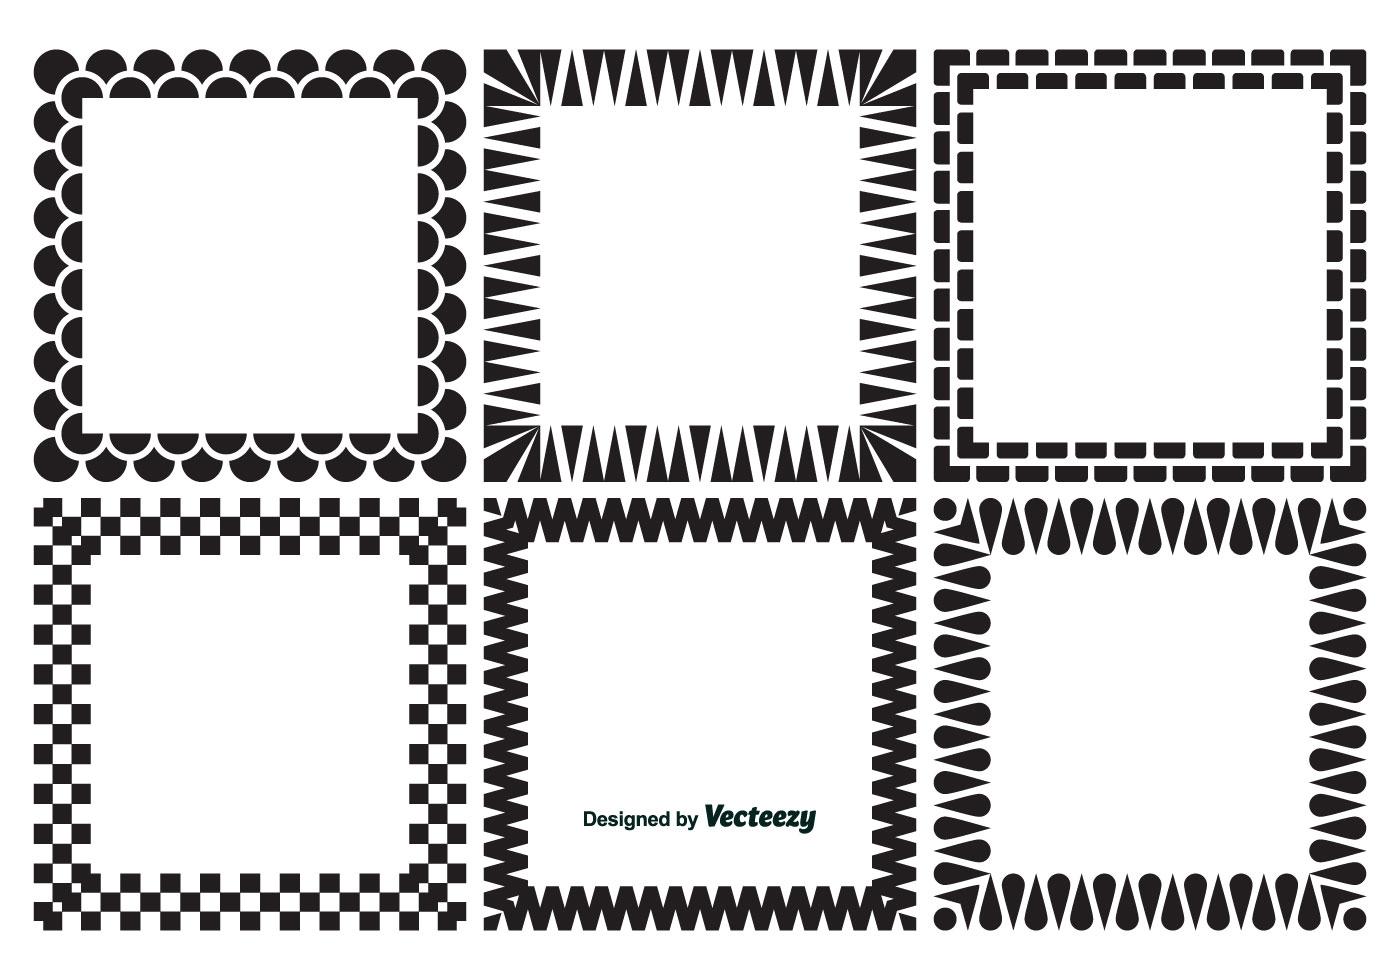 Dekorative quadratische Rahmen - Kostenlose Vektor-Kunst, Archiv ...